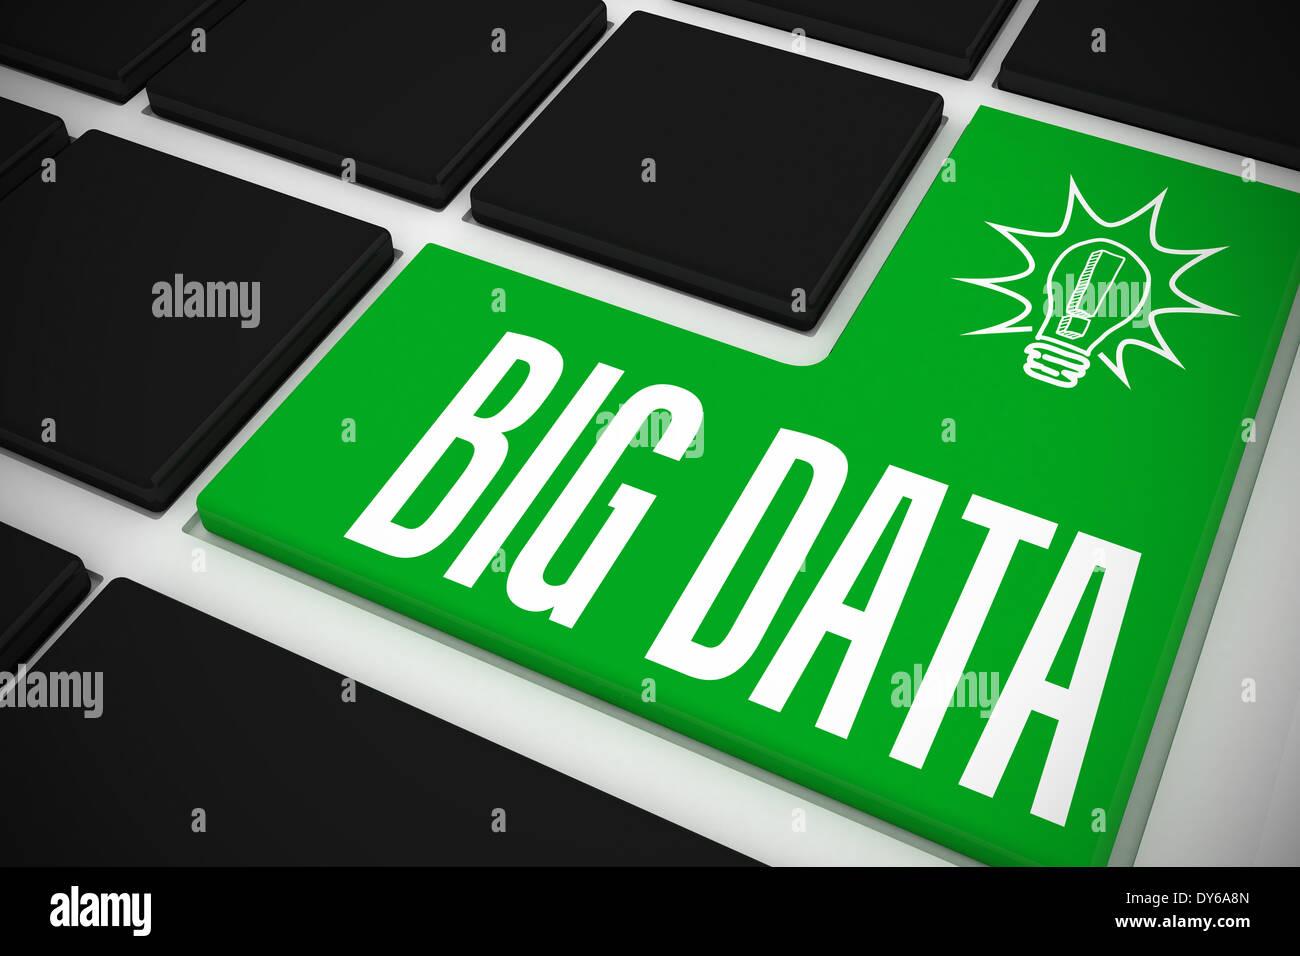 Big data on black keyboard with green key - Stock Image